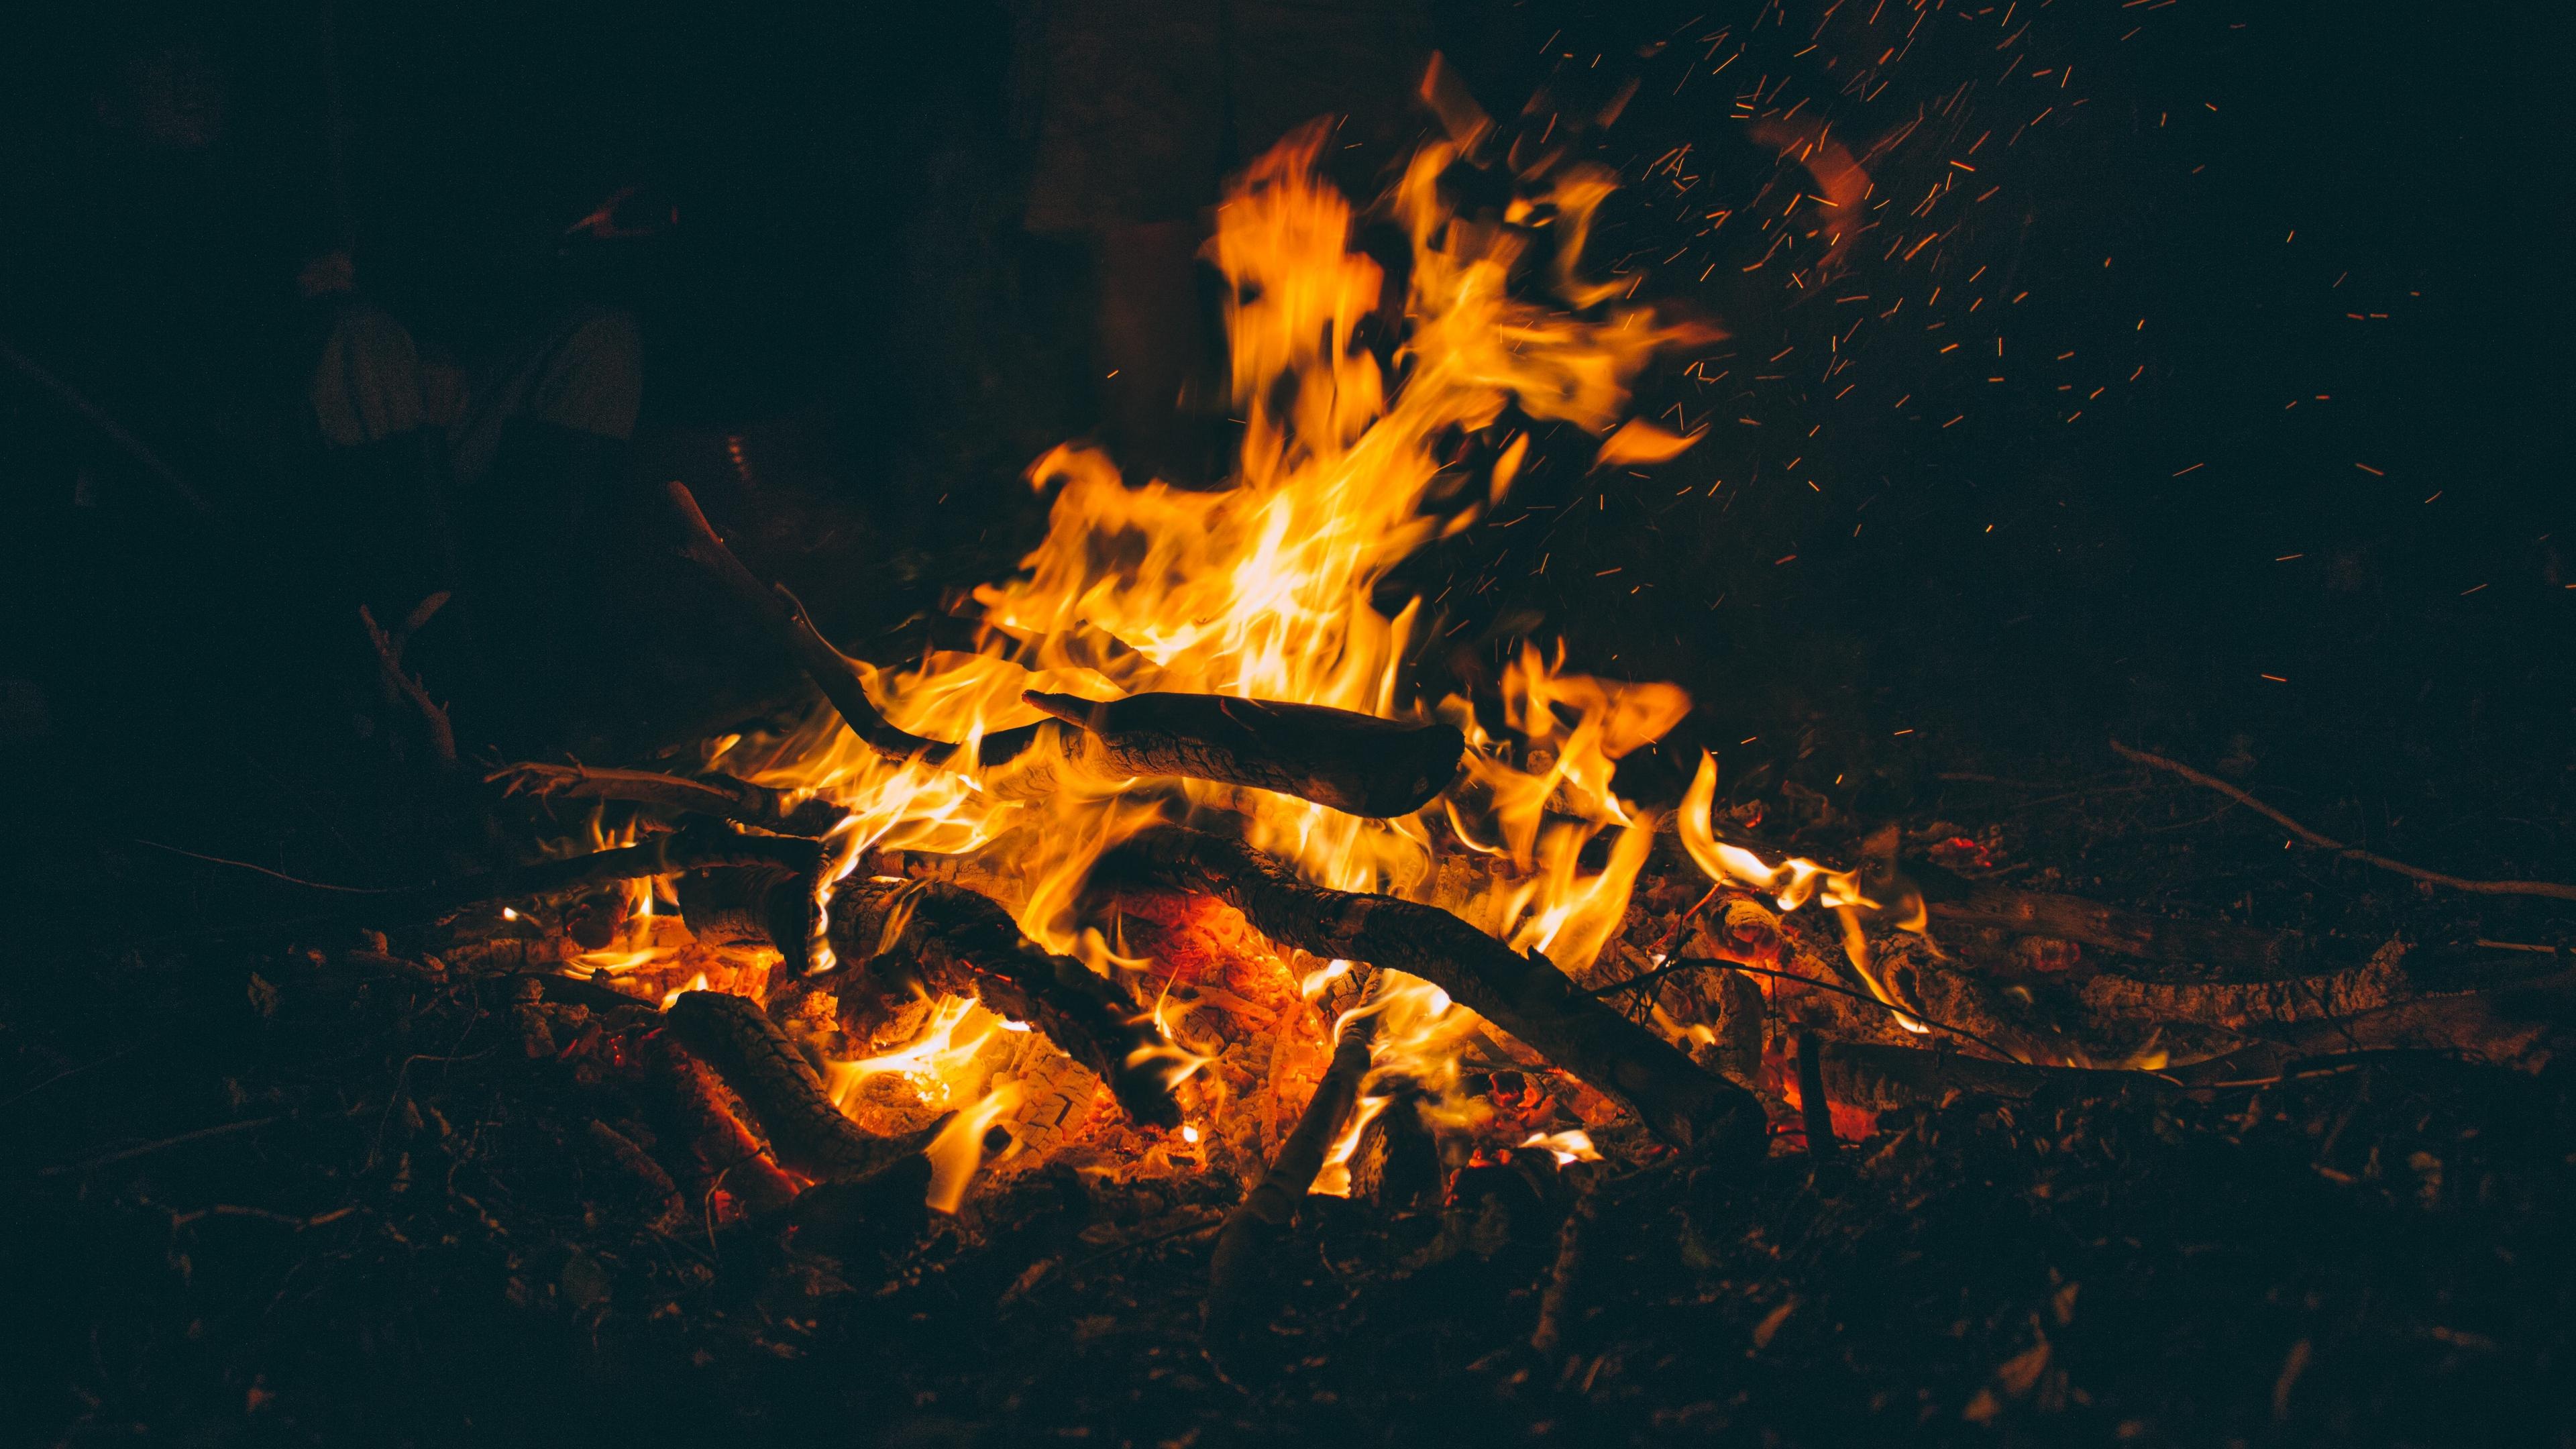 fire firewood ash 4k 1540576369 - fire, firewood, ash 4k - firewood, Fire, Ash